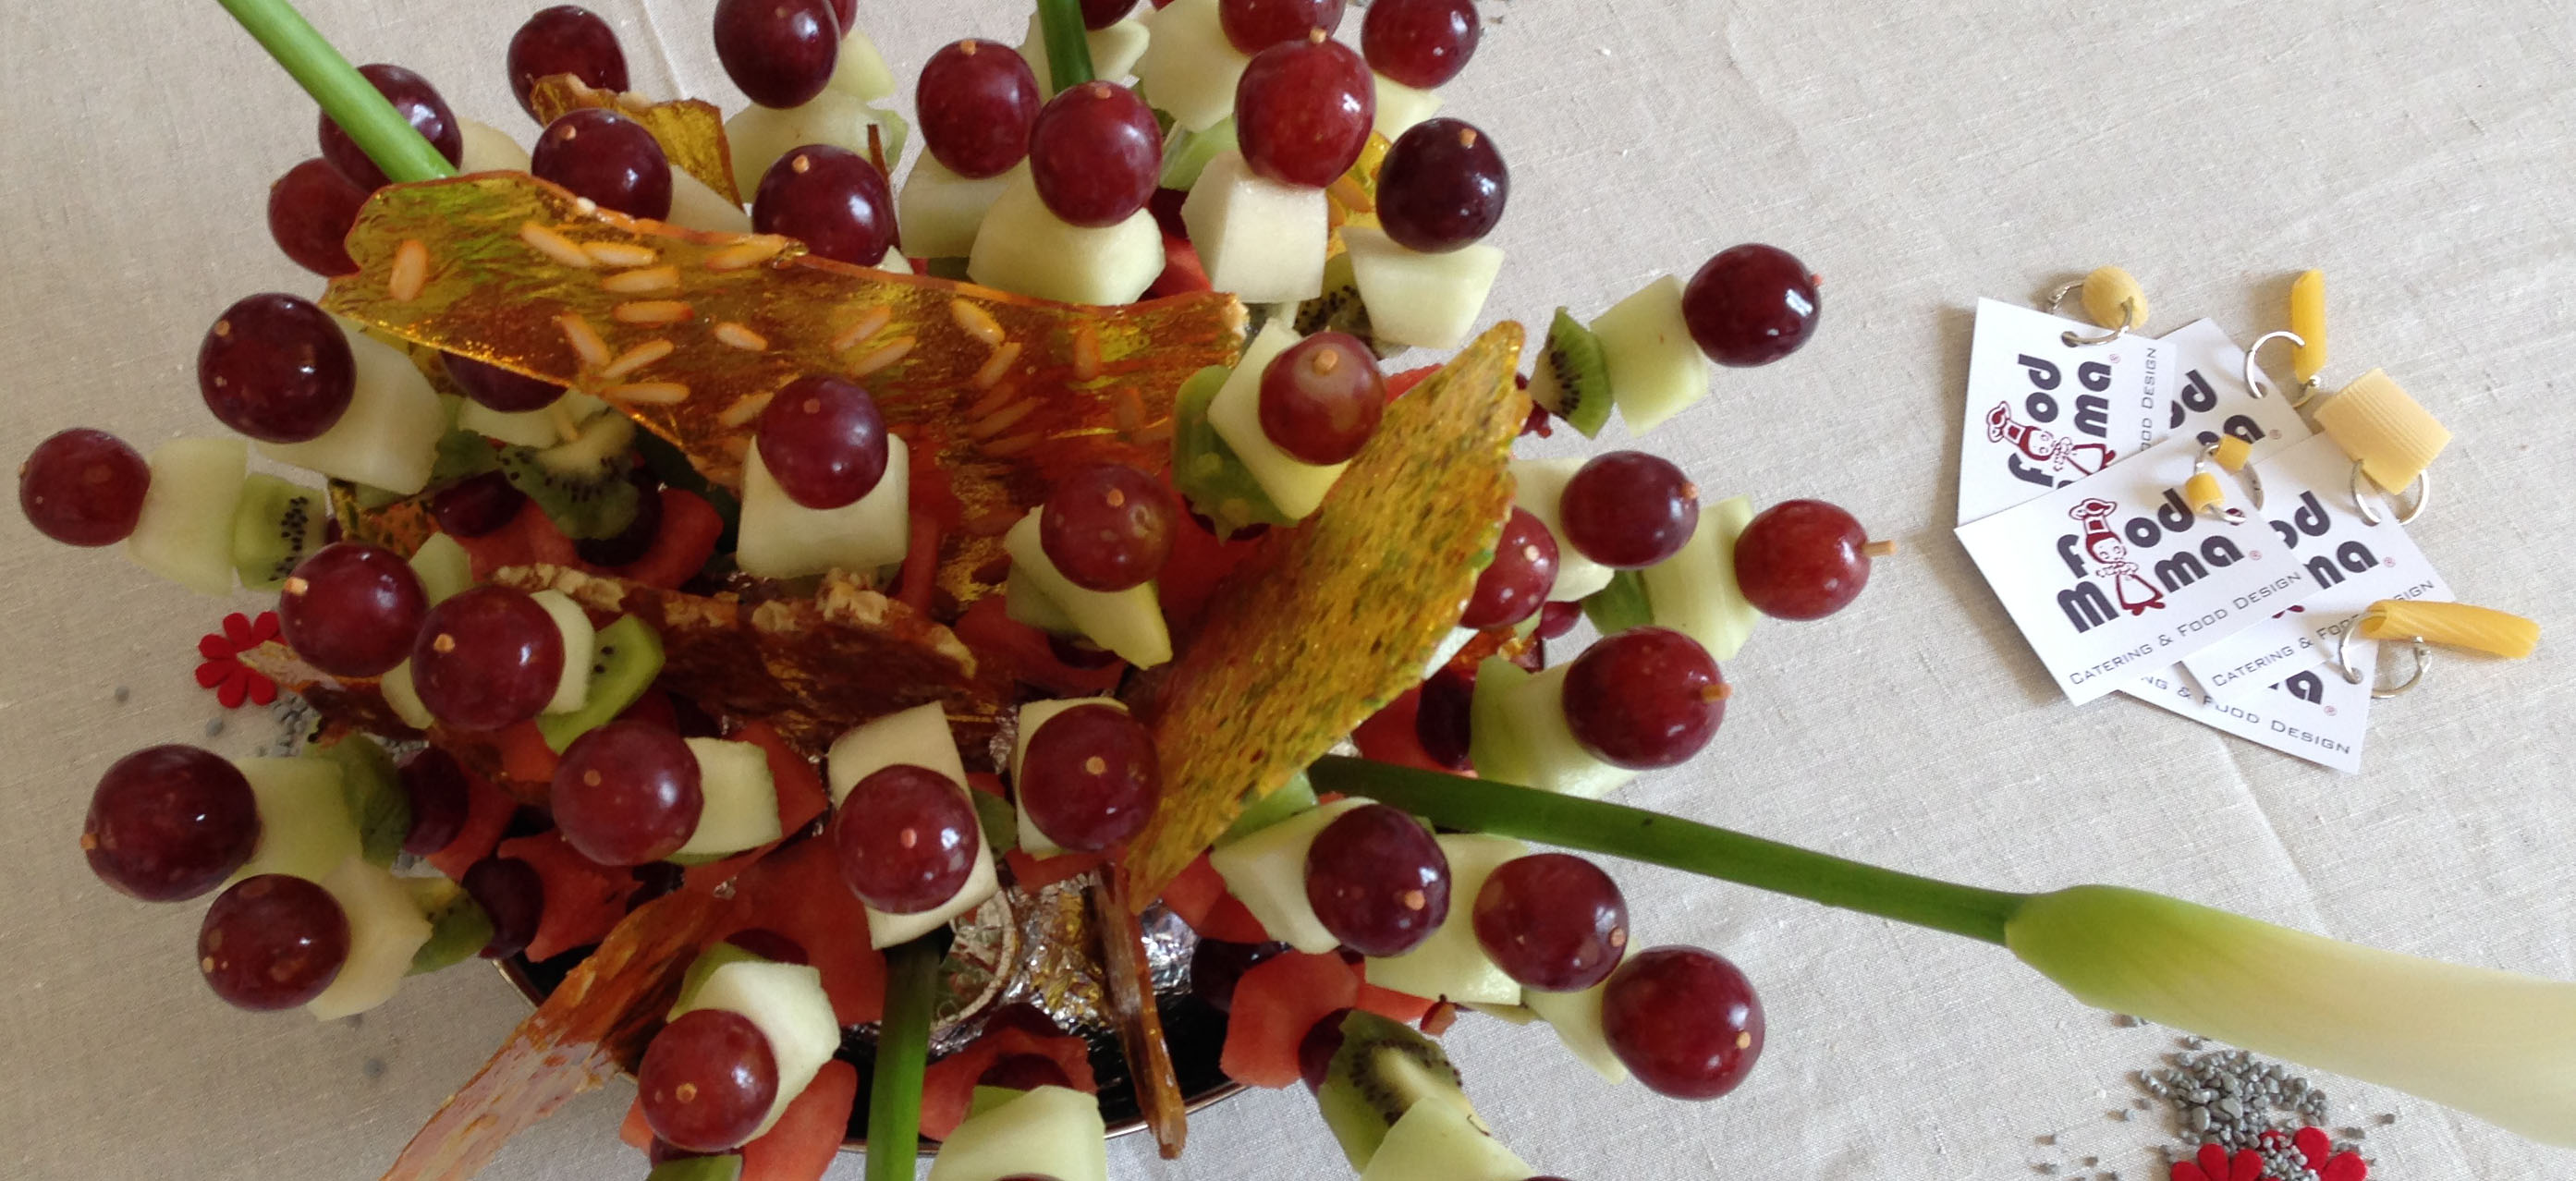 Préférence Fruit and desserts | MondoVì Group DN52